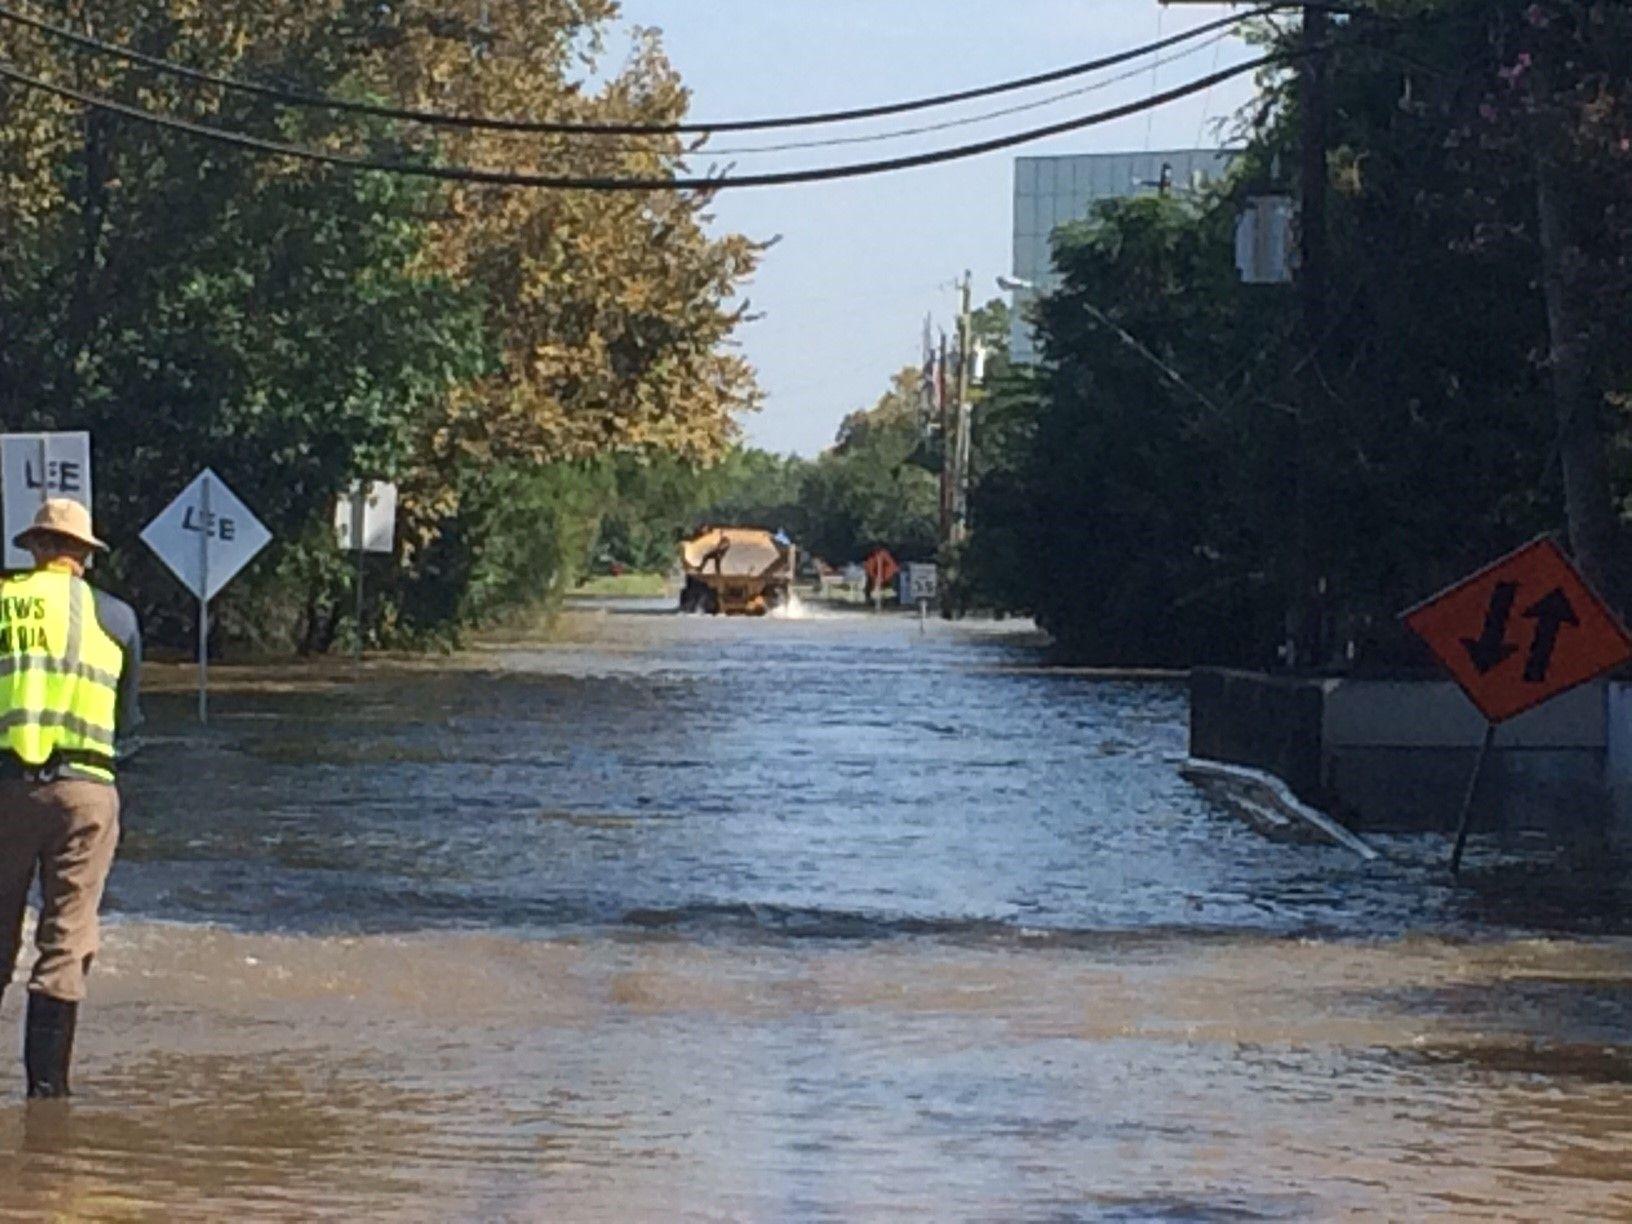 Houston Residents Share Hurricane Harvey Photos On Social Media Flood Damage Photo Harvey